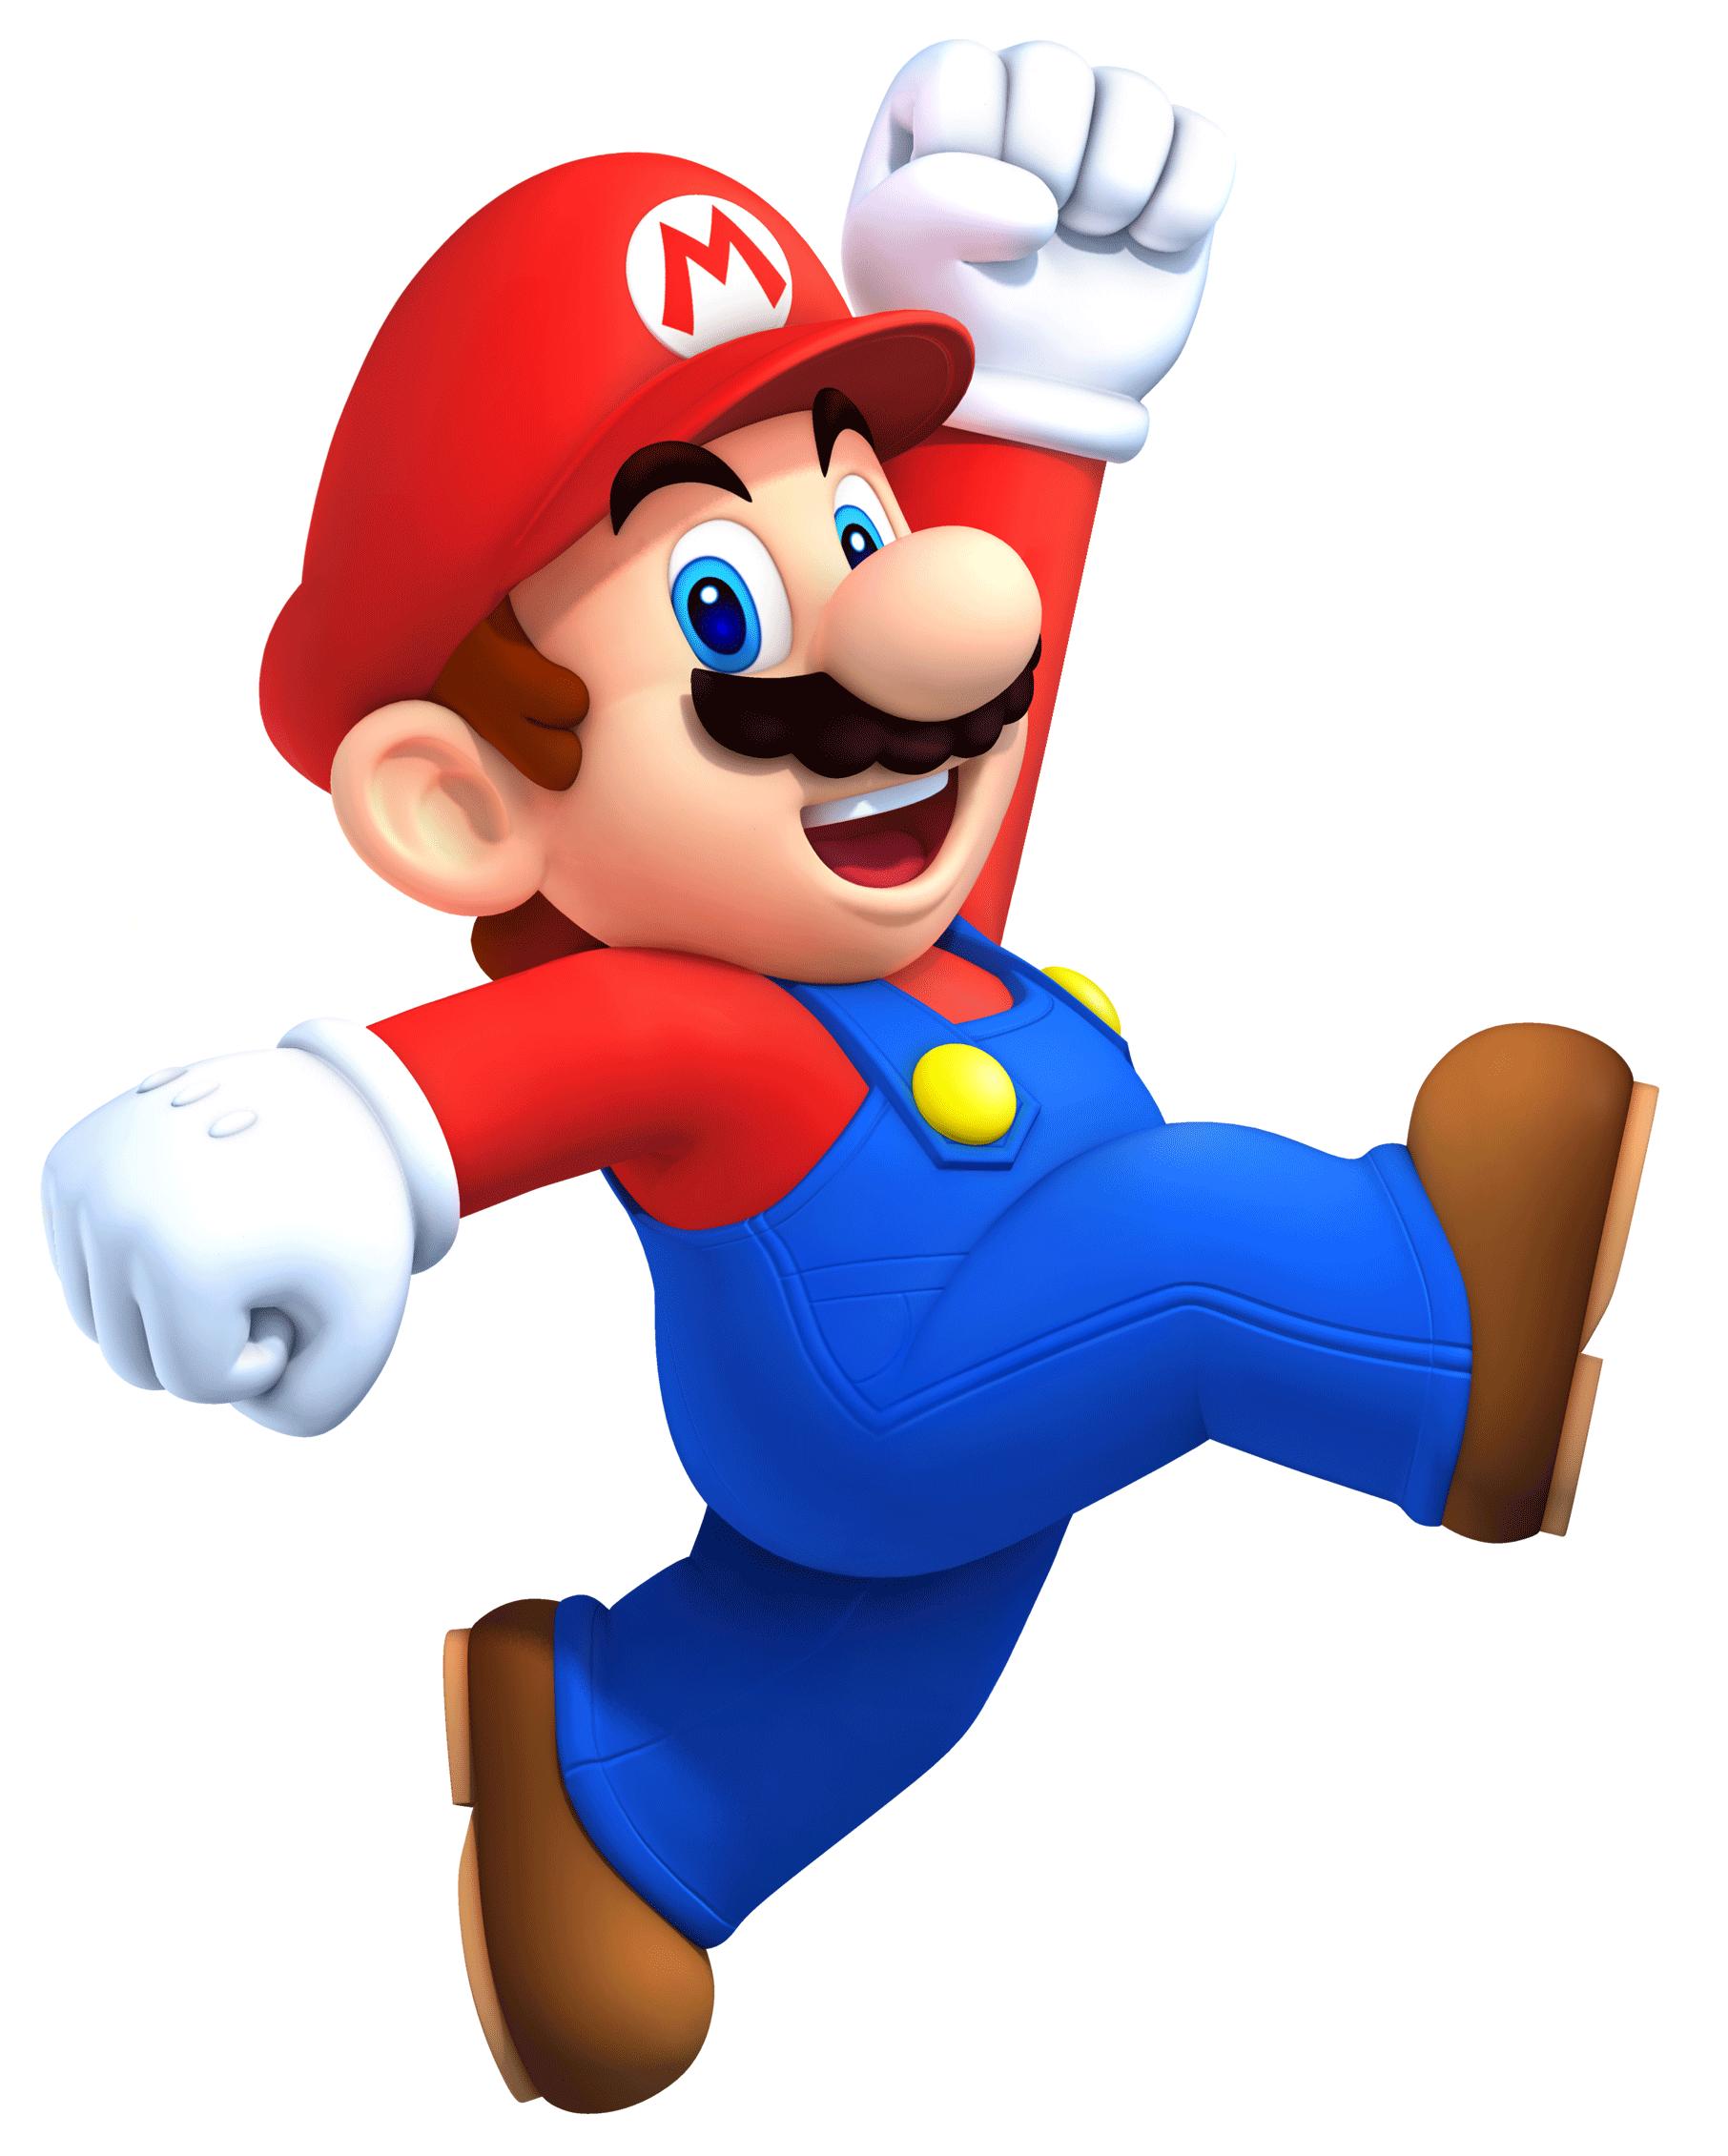 Super Mario Wallpaper Hd Wallpapers Backgrounds High Resolution Desktop Super Mario Run Mario Bros Super Mario